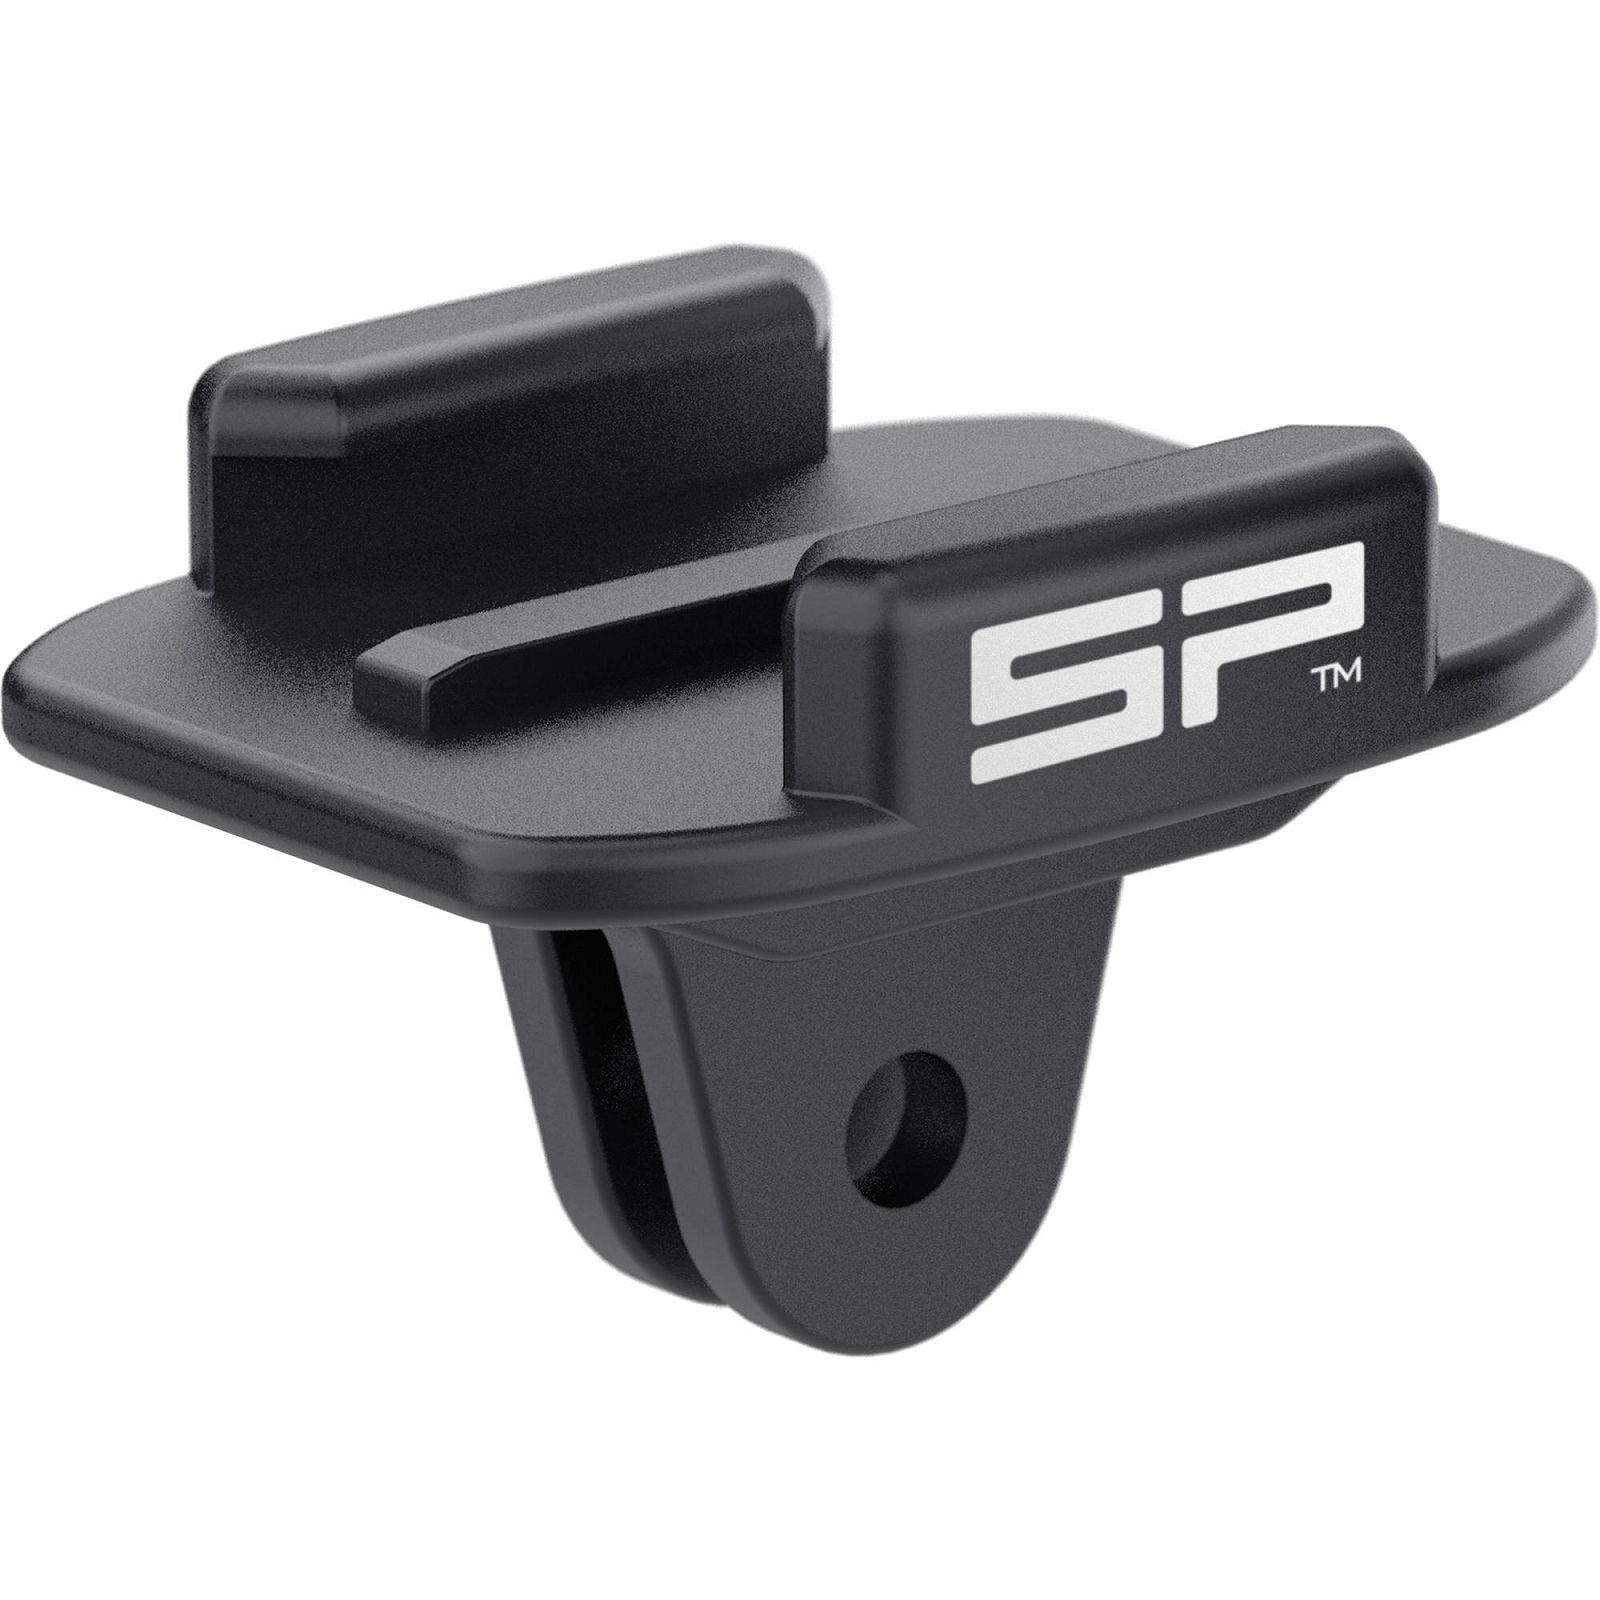 SP Gadgets SP Safety Clip sigurnosni klip za učvršćivanje sportske akcijske kamere (53152)